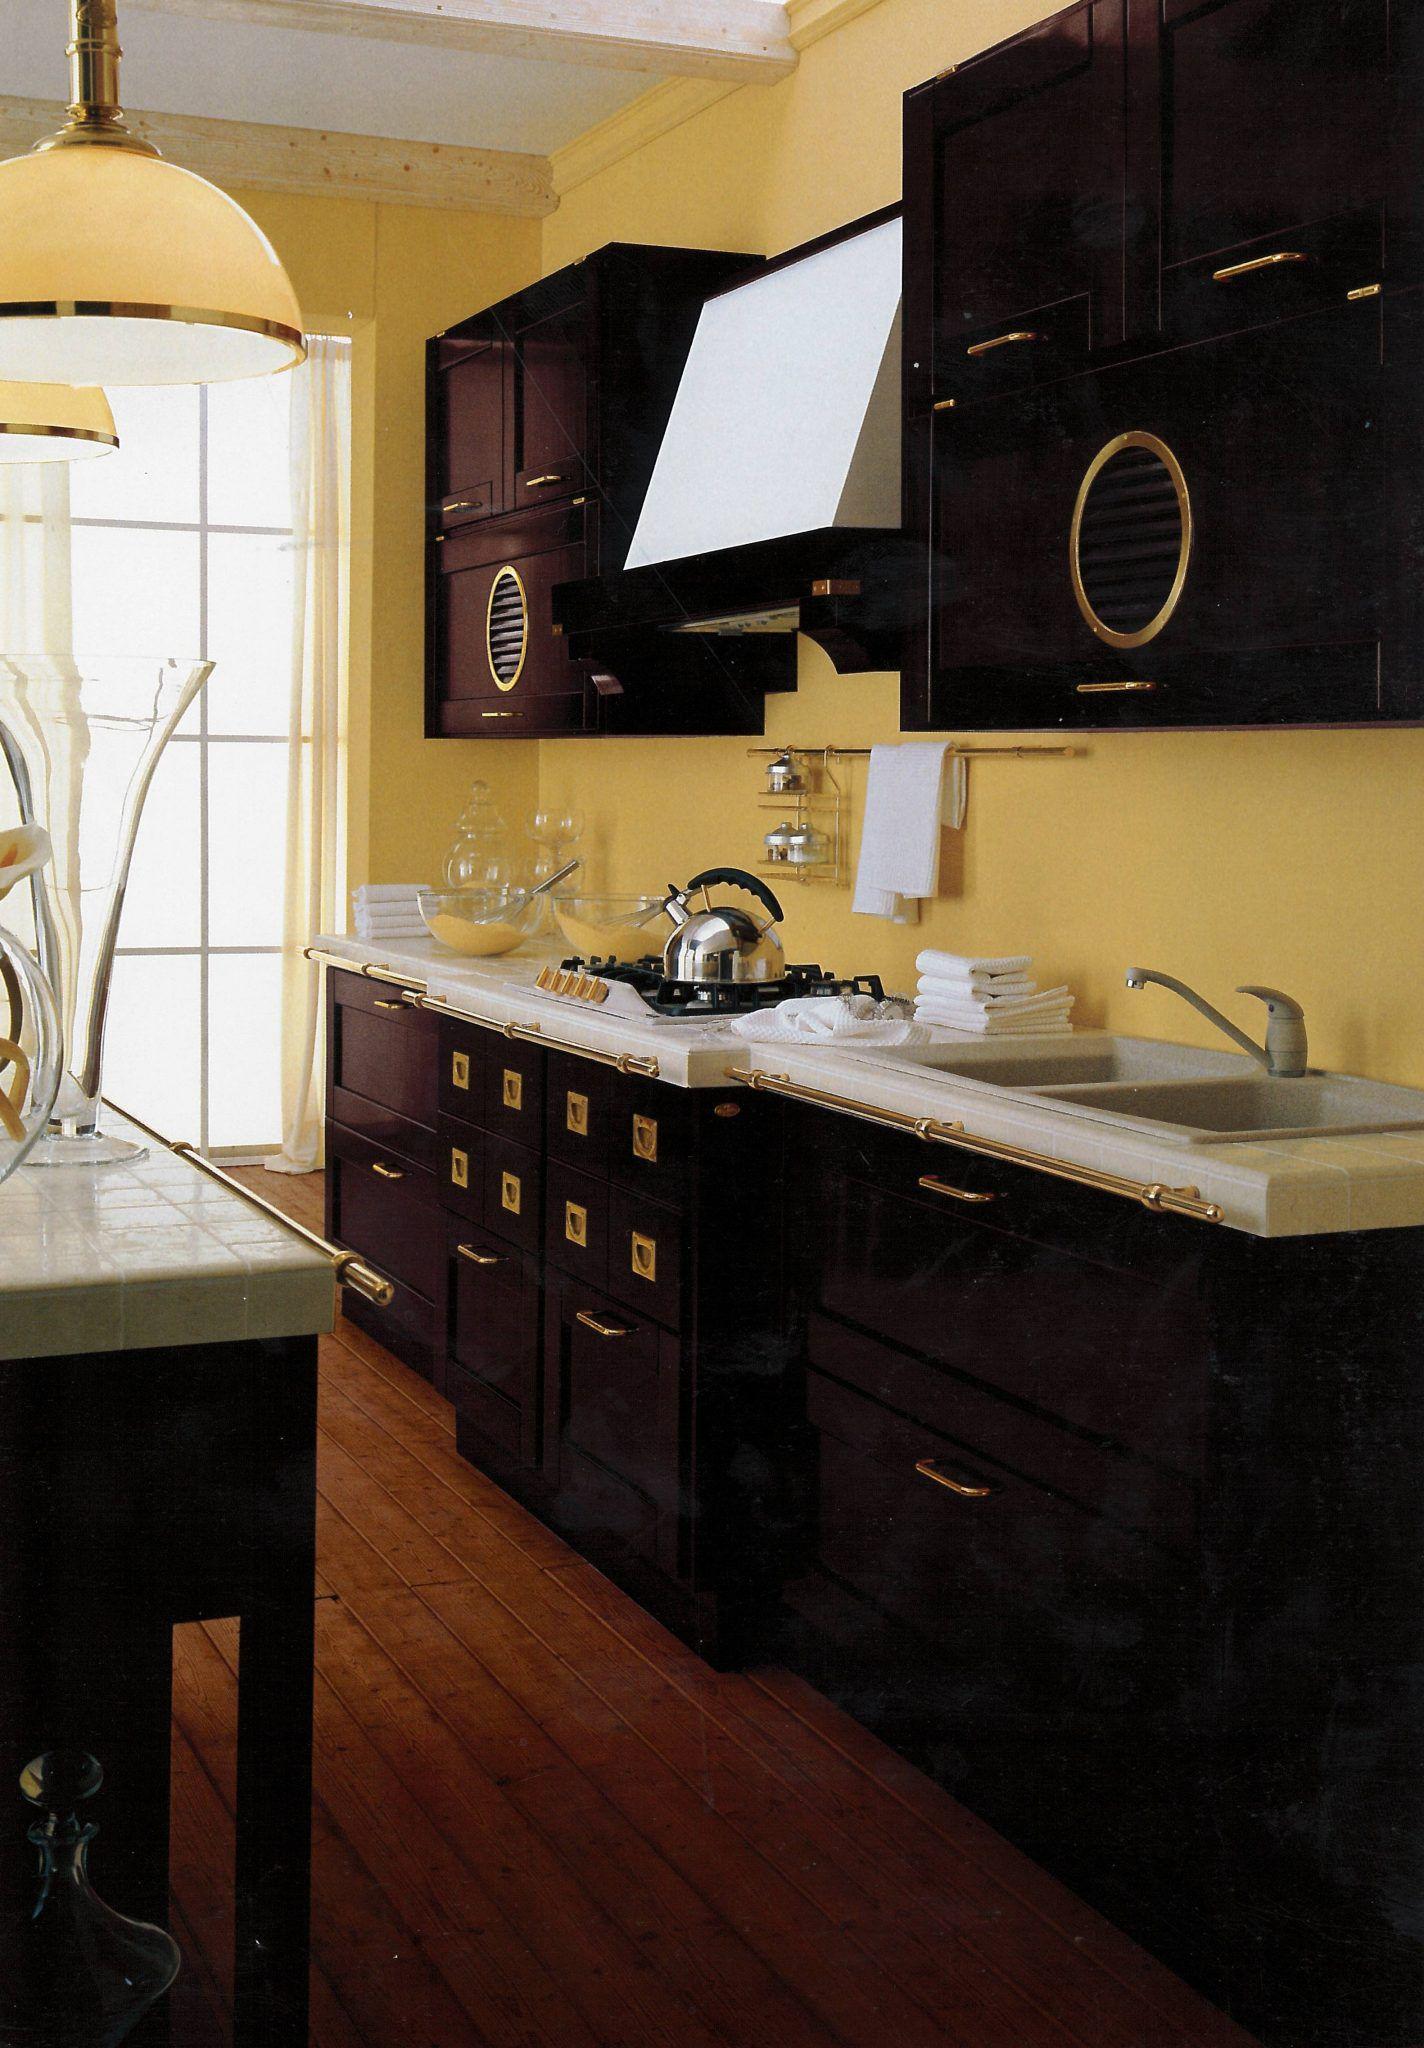 Arredamento stile marinaro vendita on line for Vendita on line arredamento